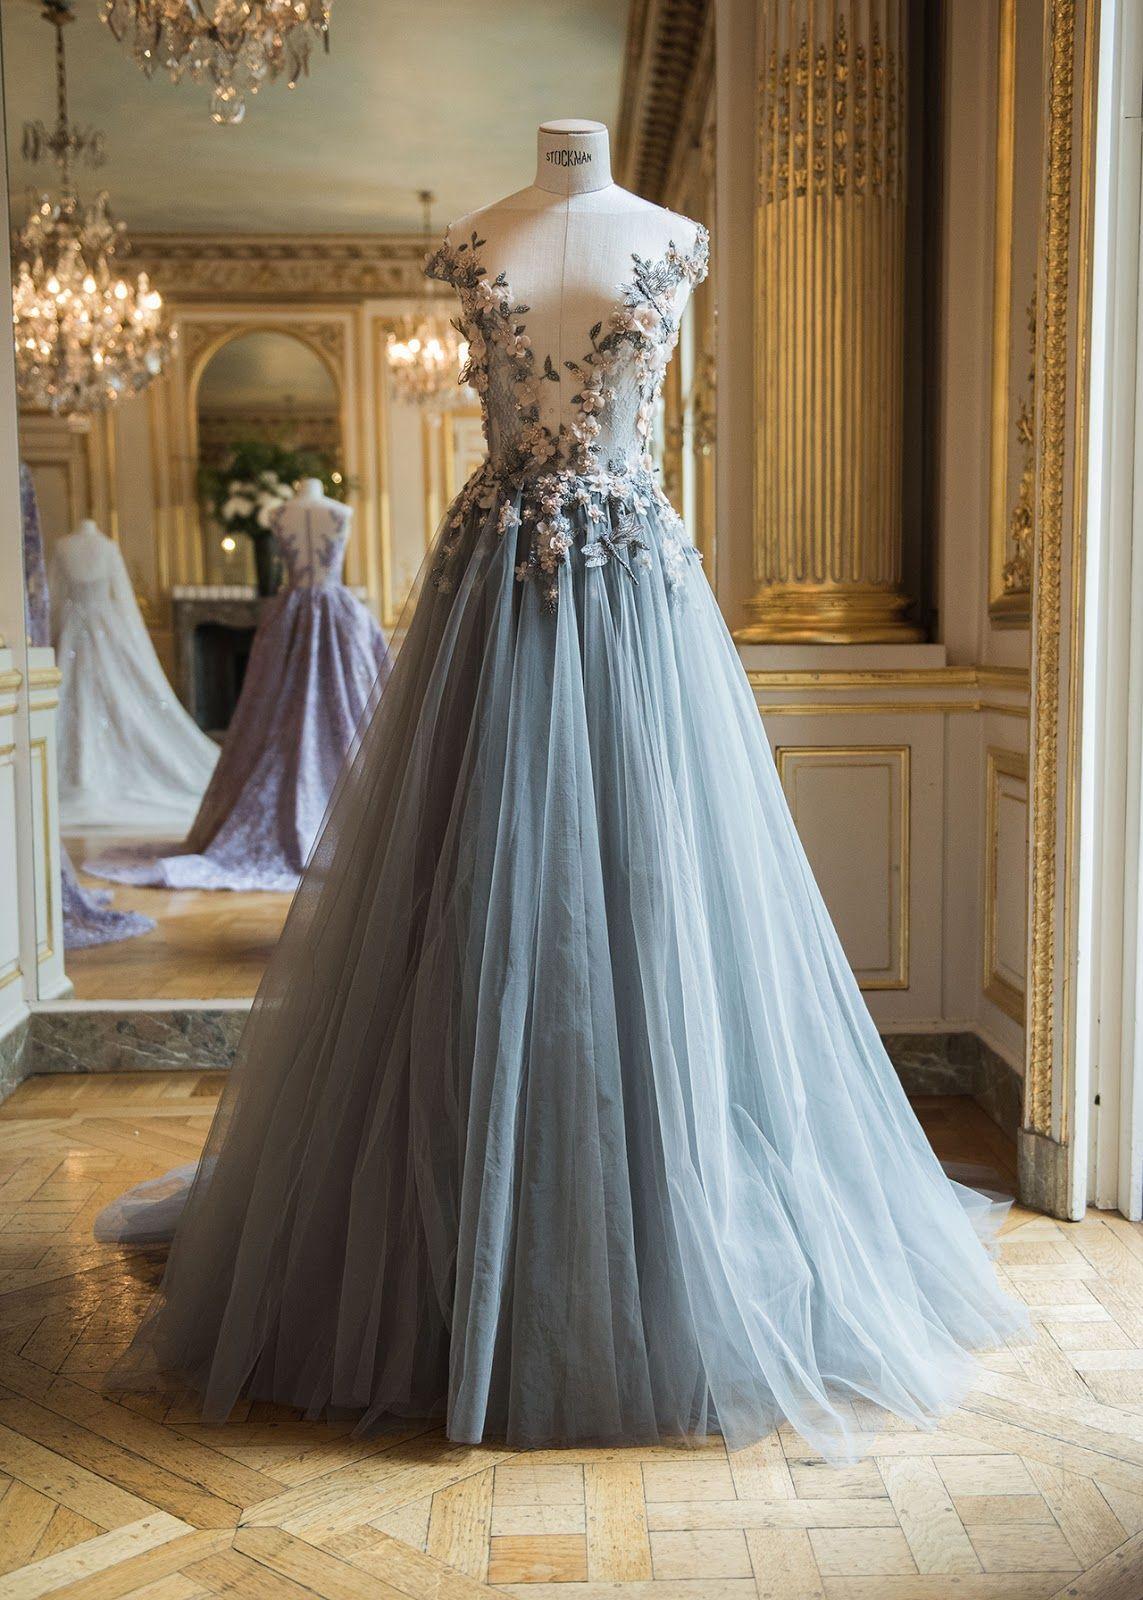 Fashion | A gown, for the ball... | Pinterest | Paolo sebastian ...